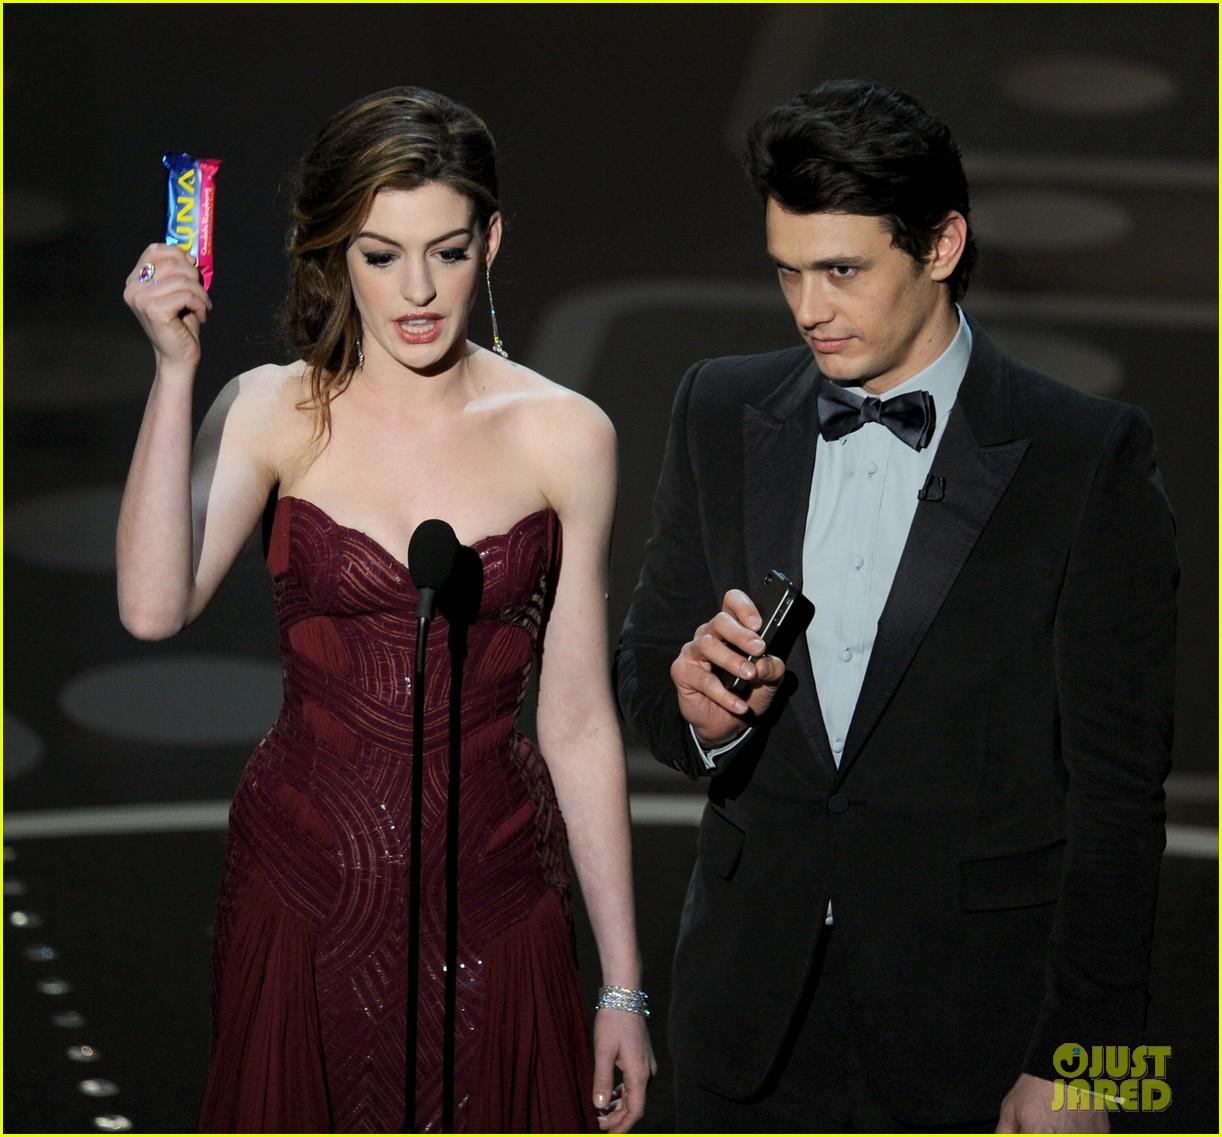 Anne Hathaway James Franco: Anne Hathaway Mocks Herself Over Oscars 2011 Hosting Gig